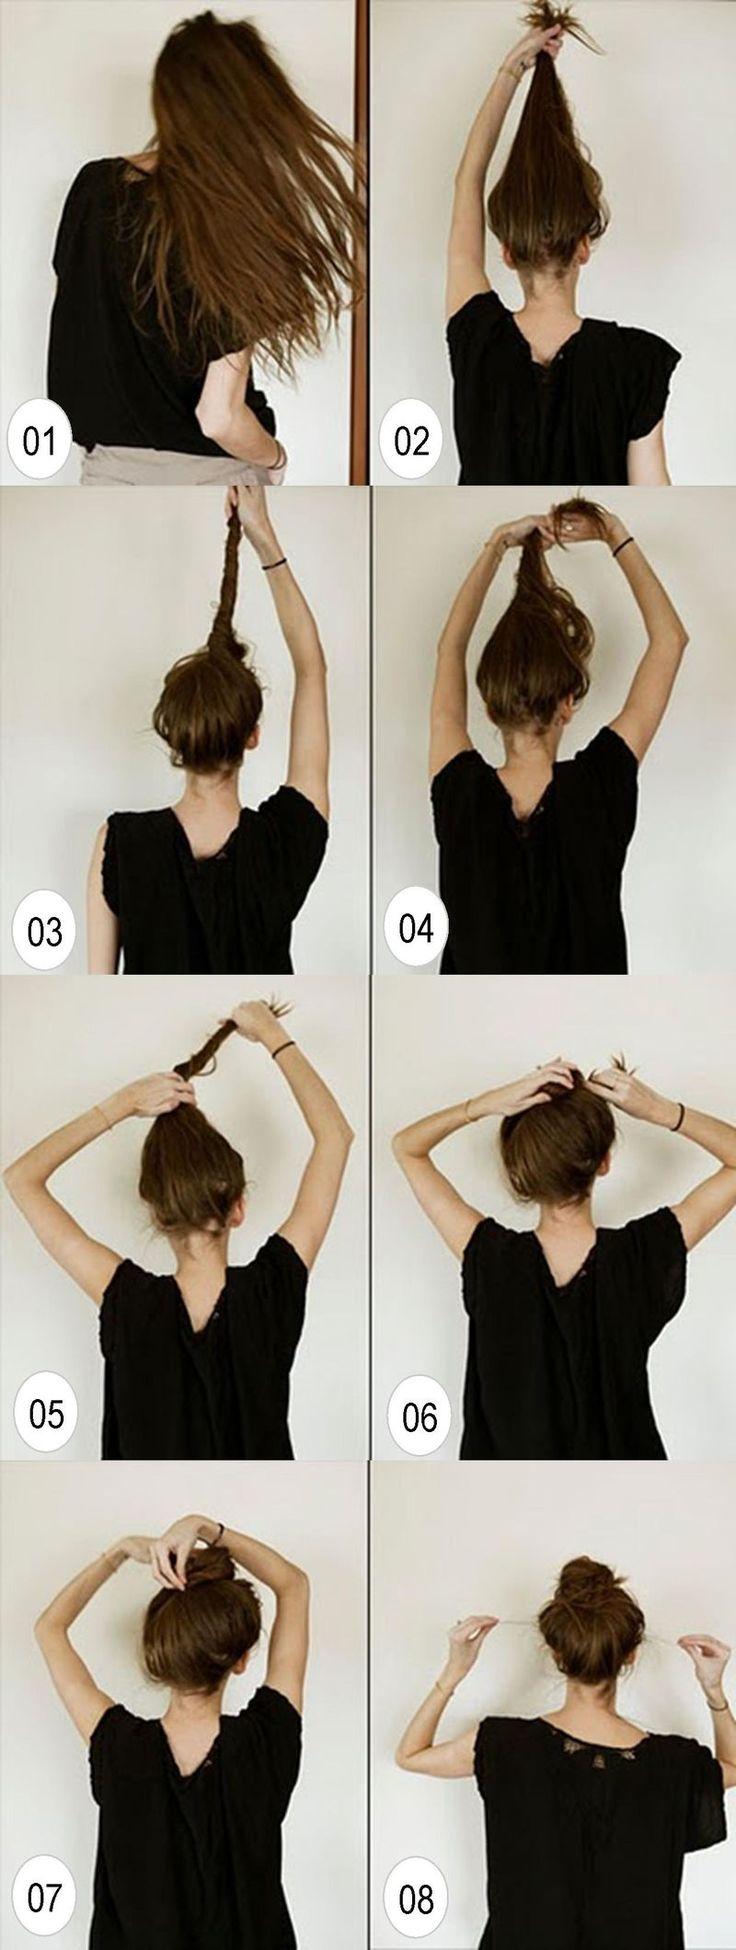 How to make a perfect messy bun [7 pics] | Fashion Inspiration Blog